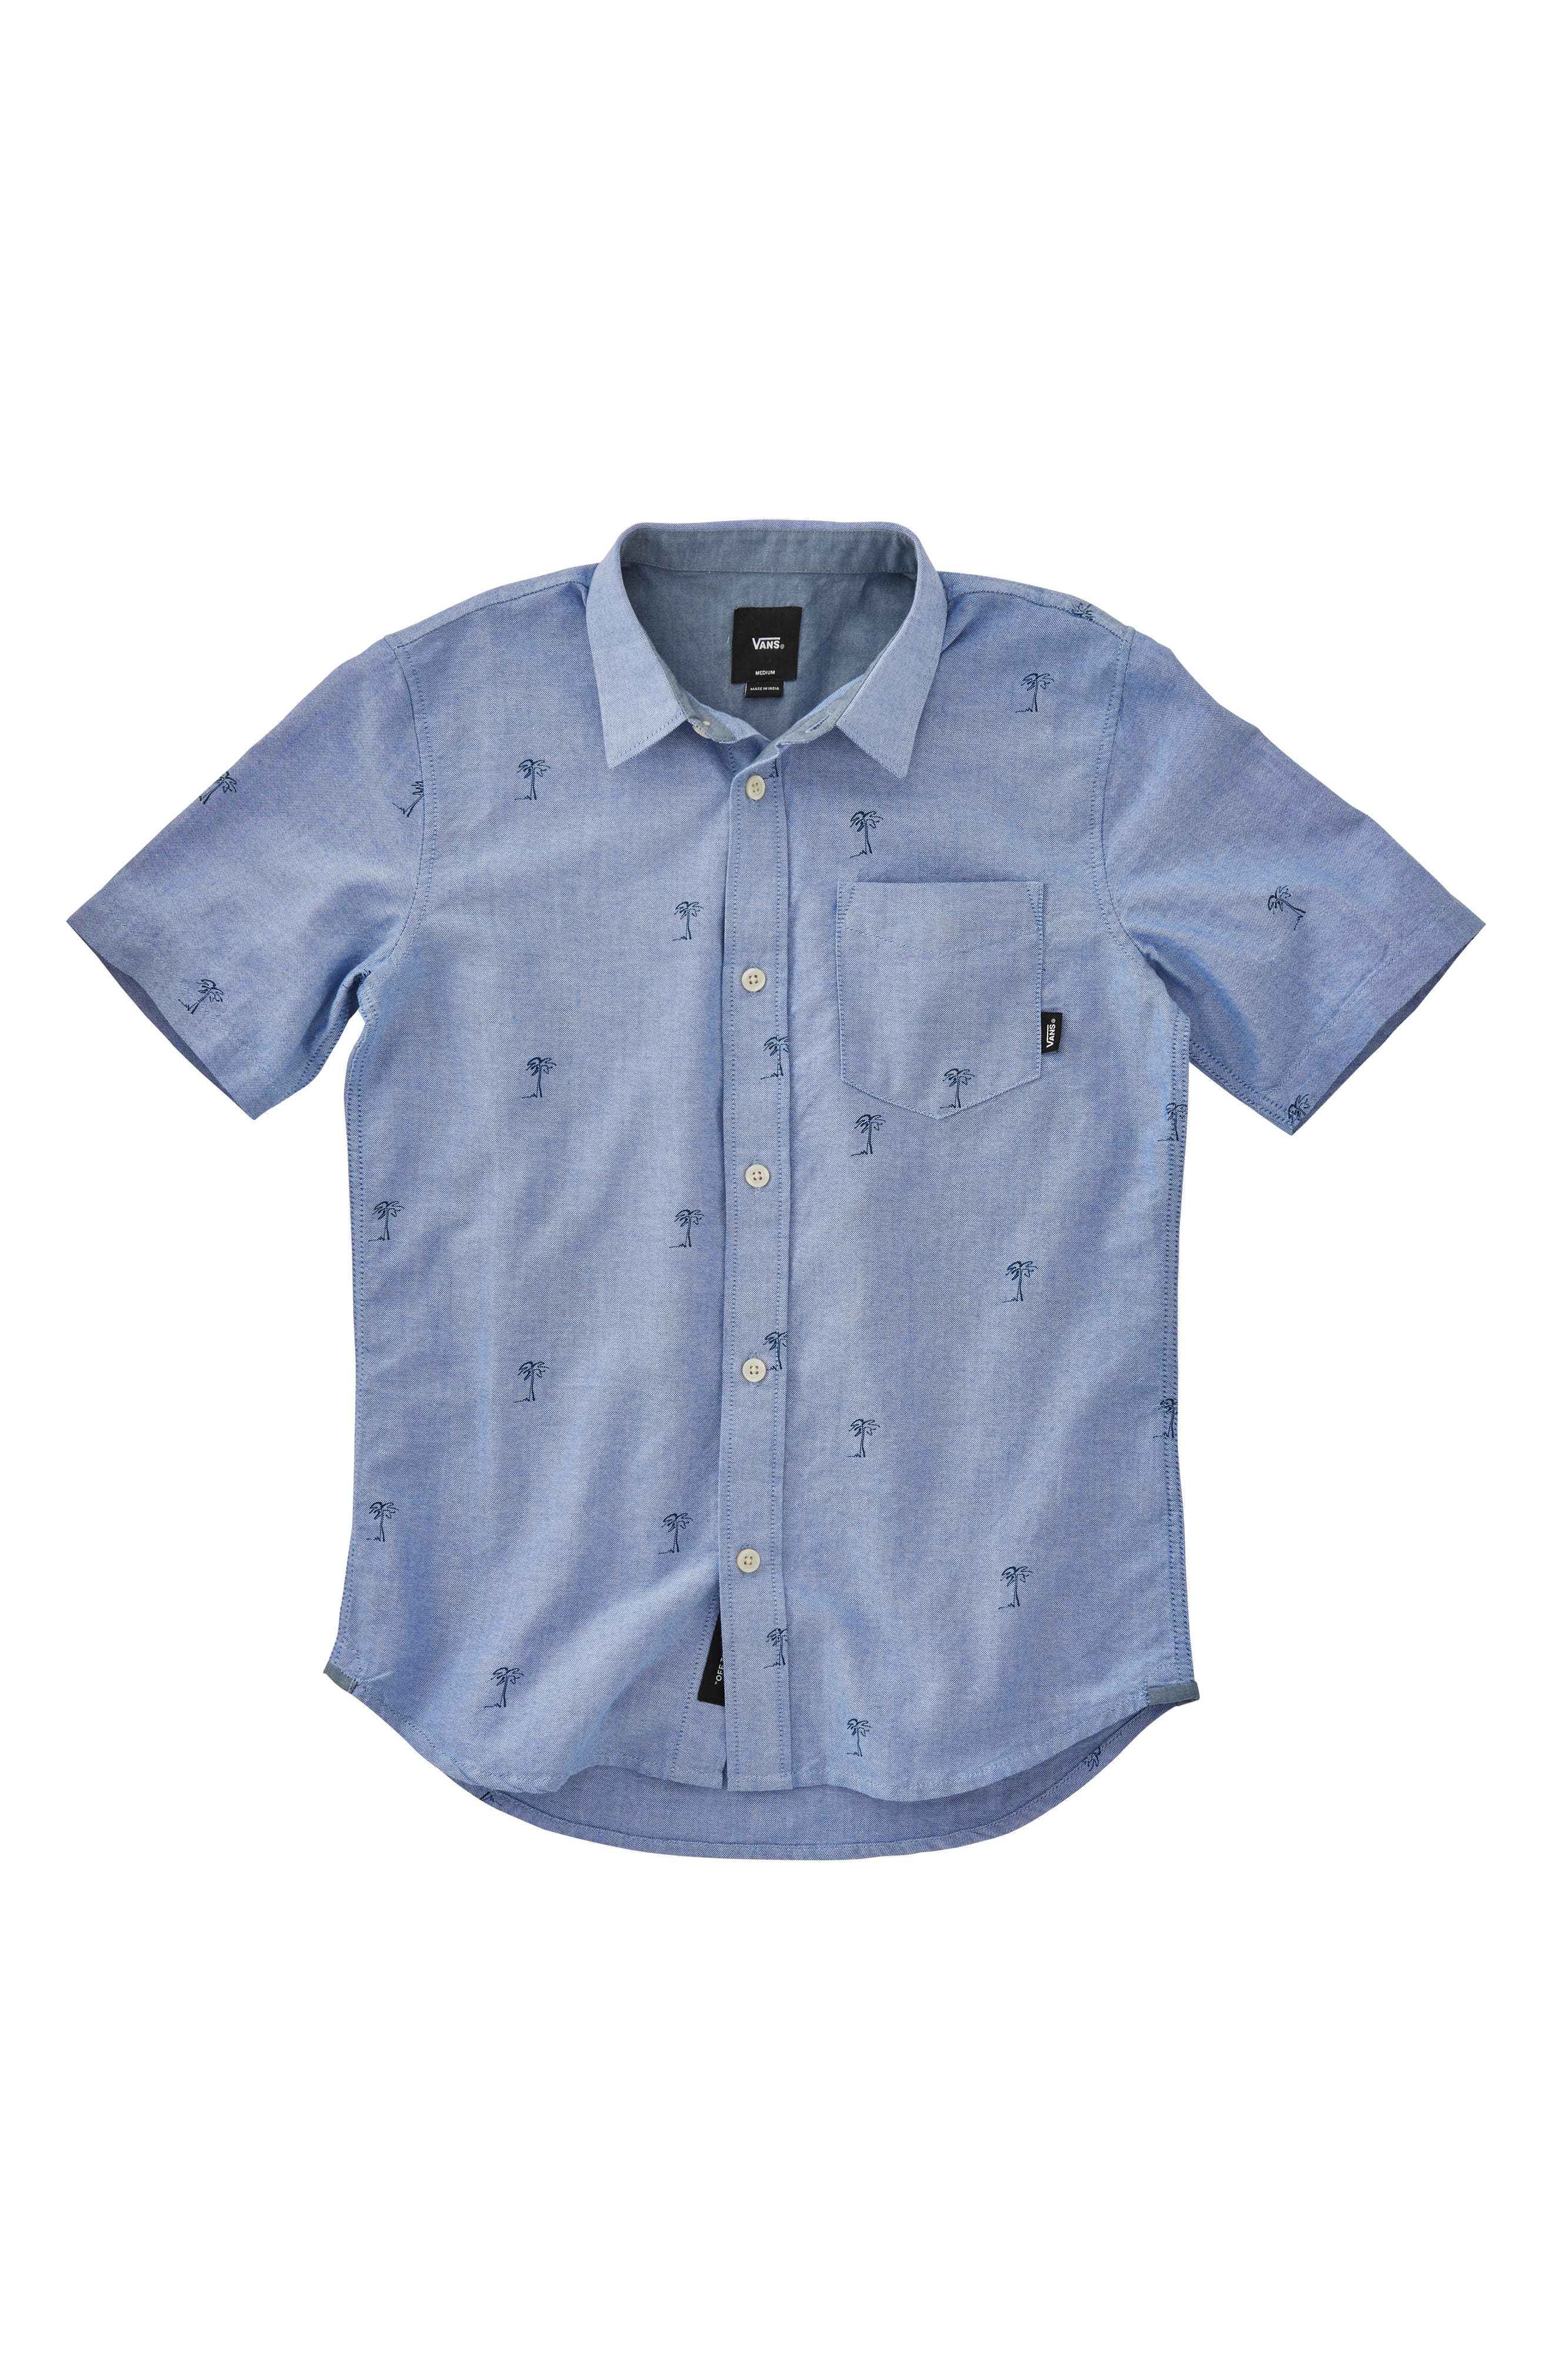 Houser Woven Shirt,                             Main thumbnail 1, color,                             MAZARINE BLUE